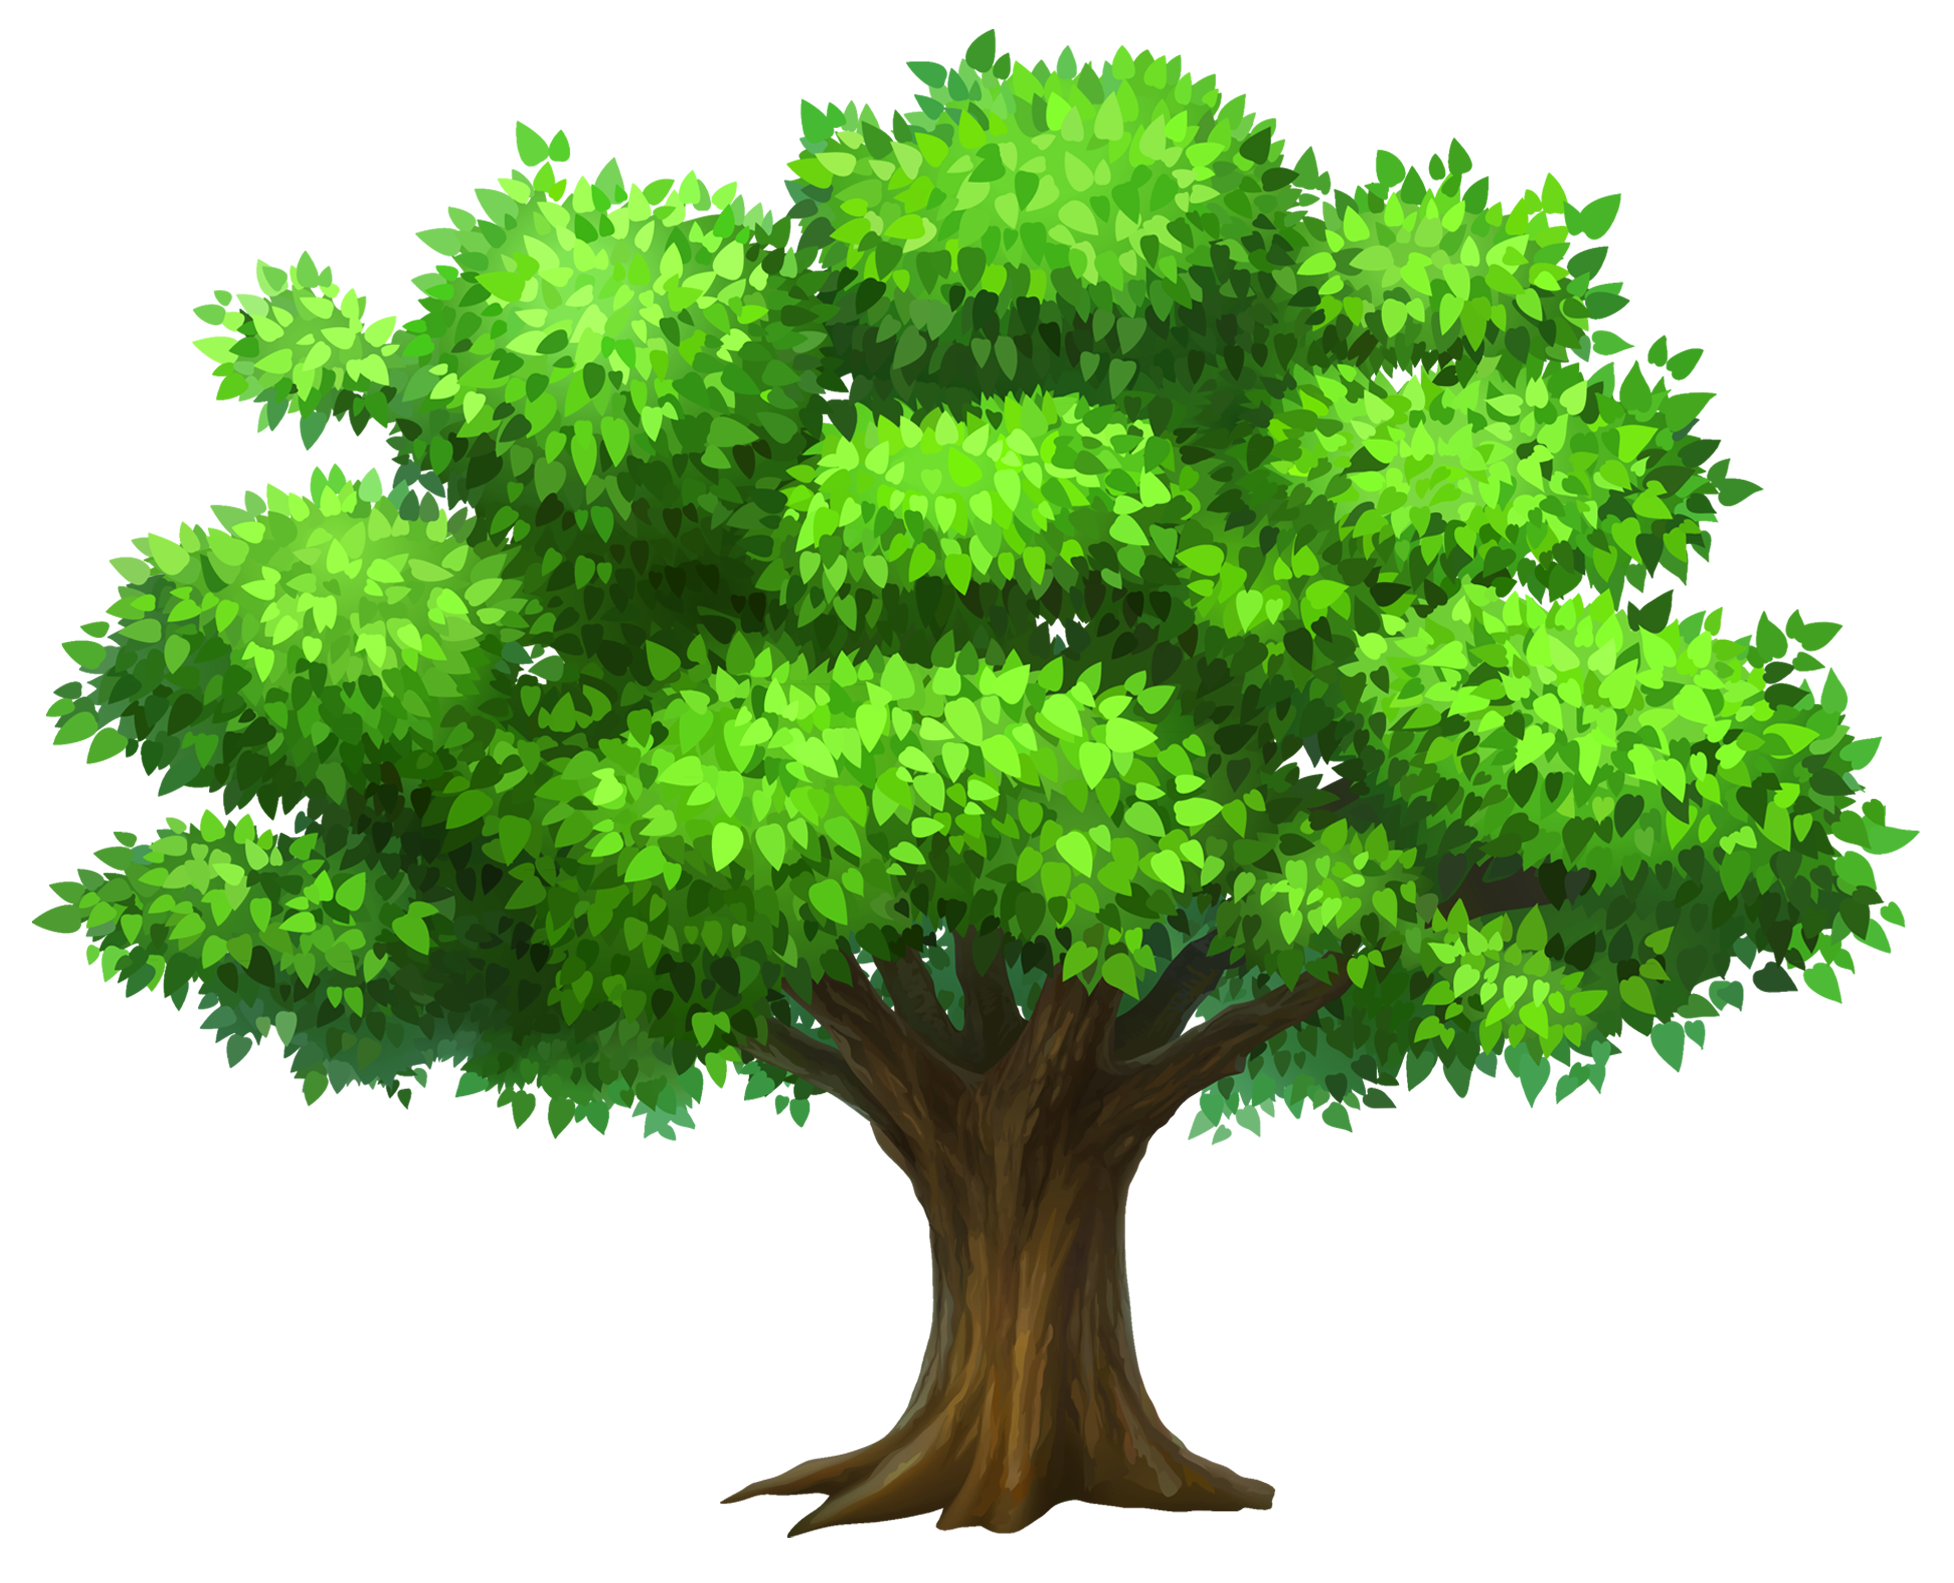 Bare Tree Clipart Free Clipart Image-Bare Tree Clipart Free Clipart Image-0